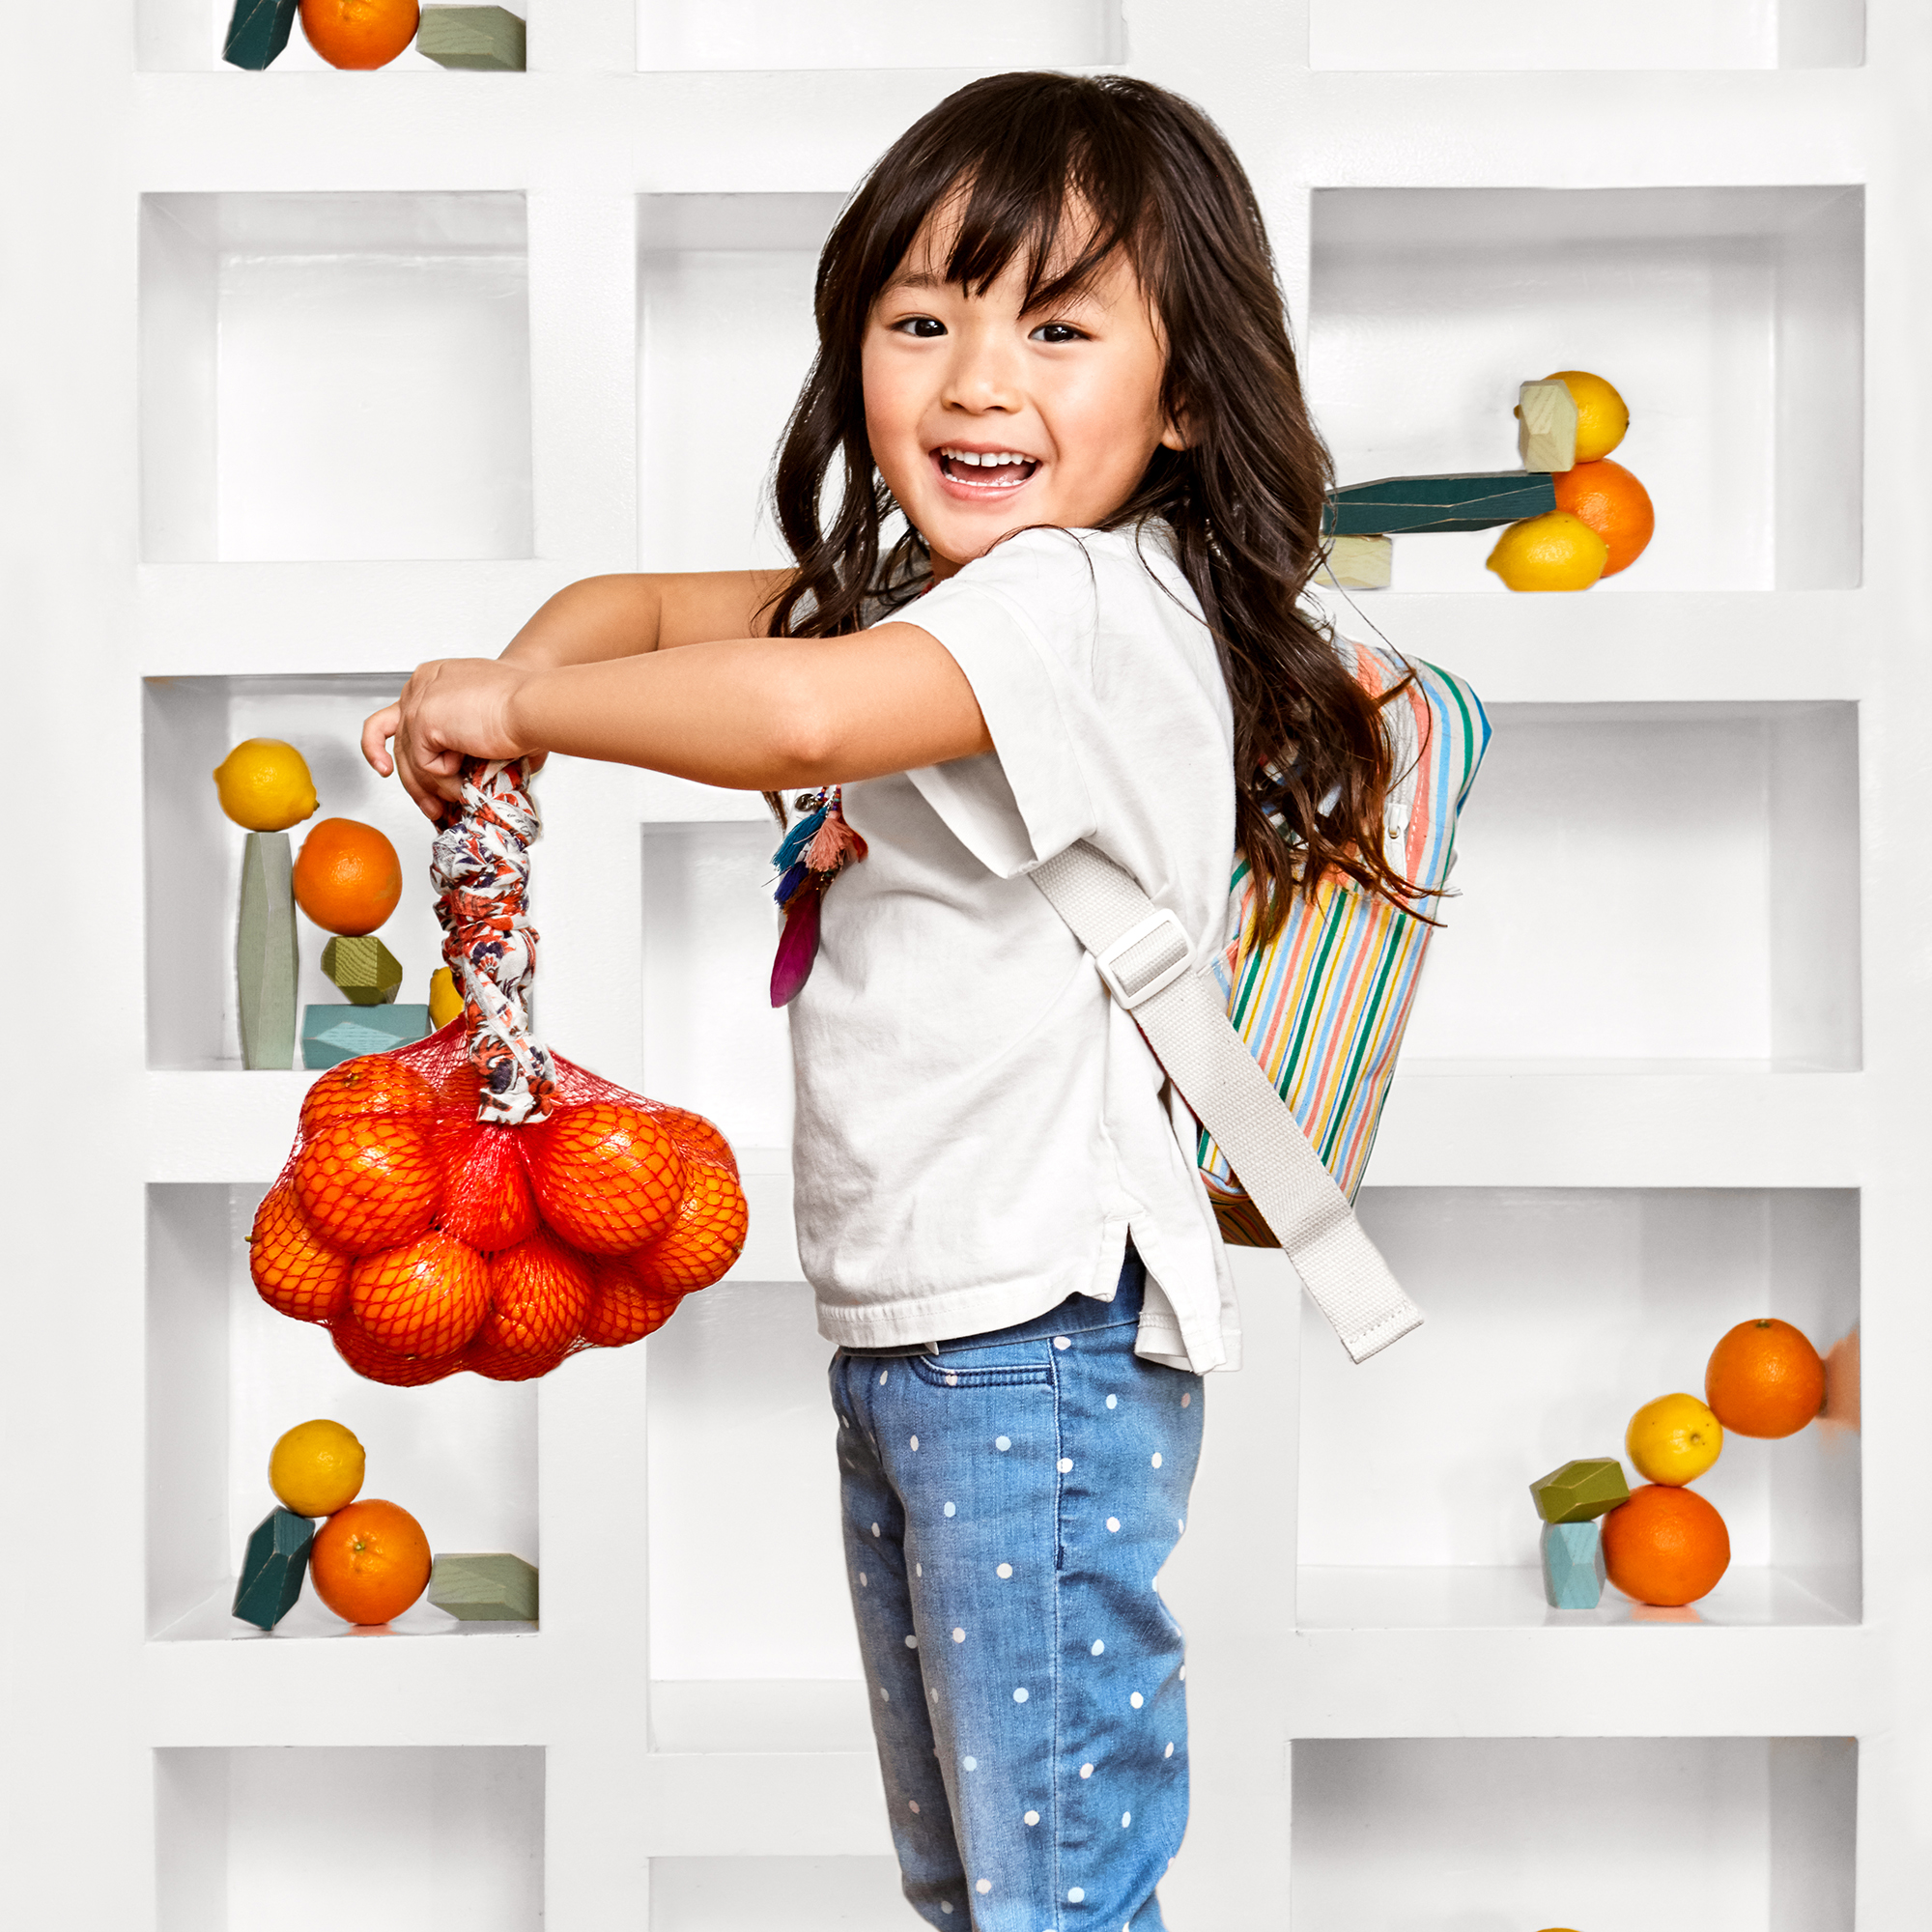 girl holding a bag of oranges